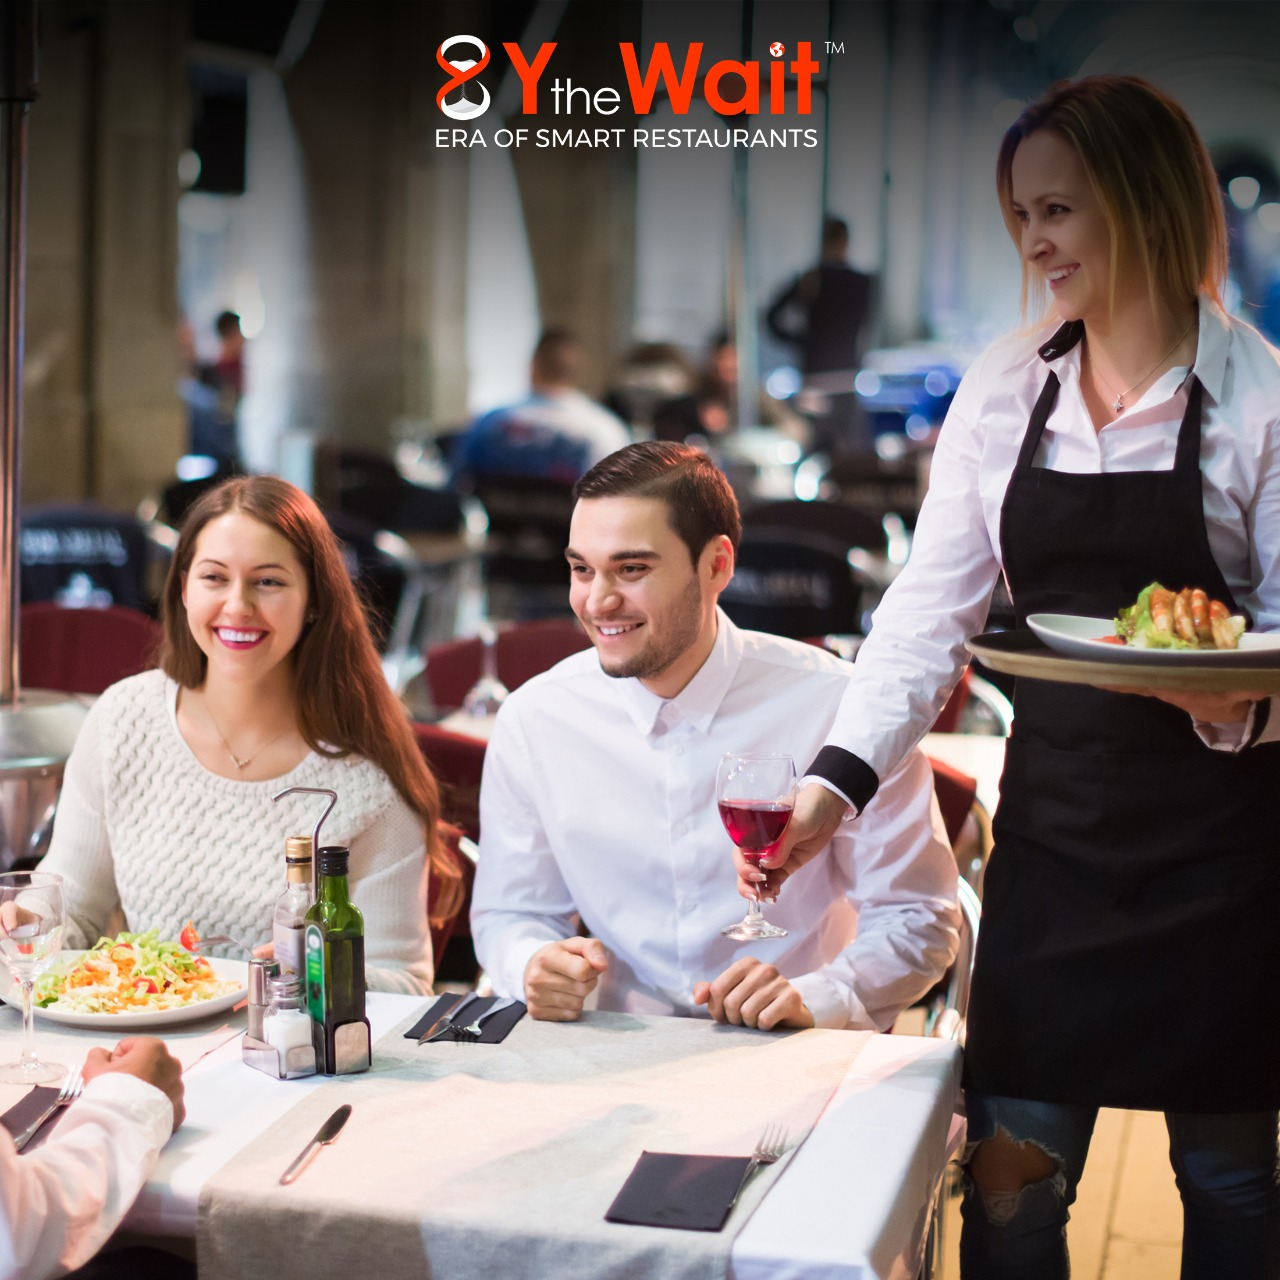 Y the Wait - Digital Waiter App - Smart Dine In